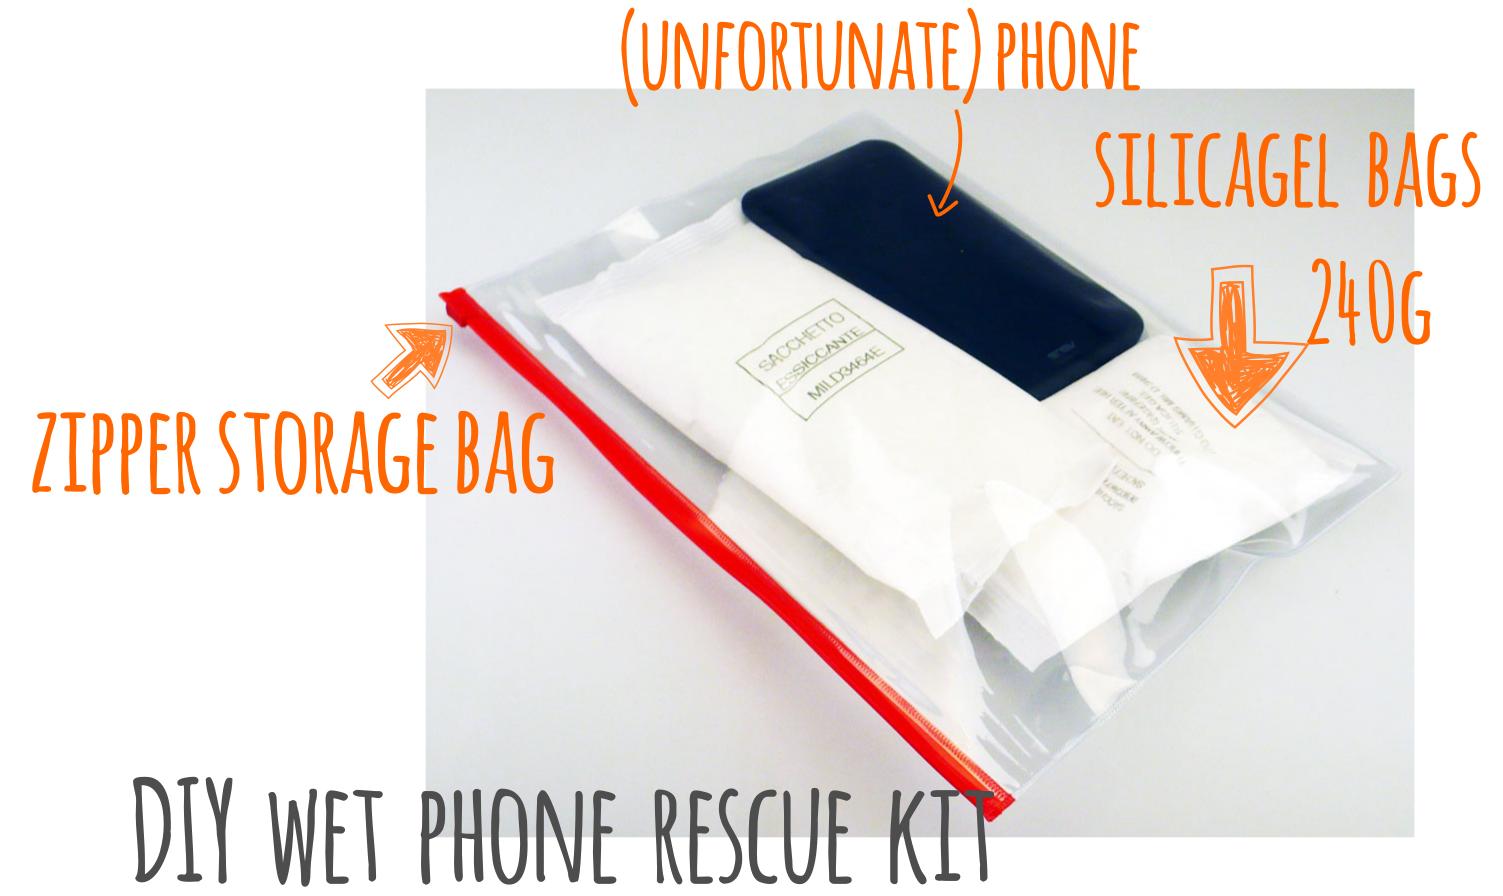 kit rescue wet phone DIY